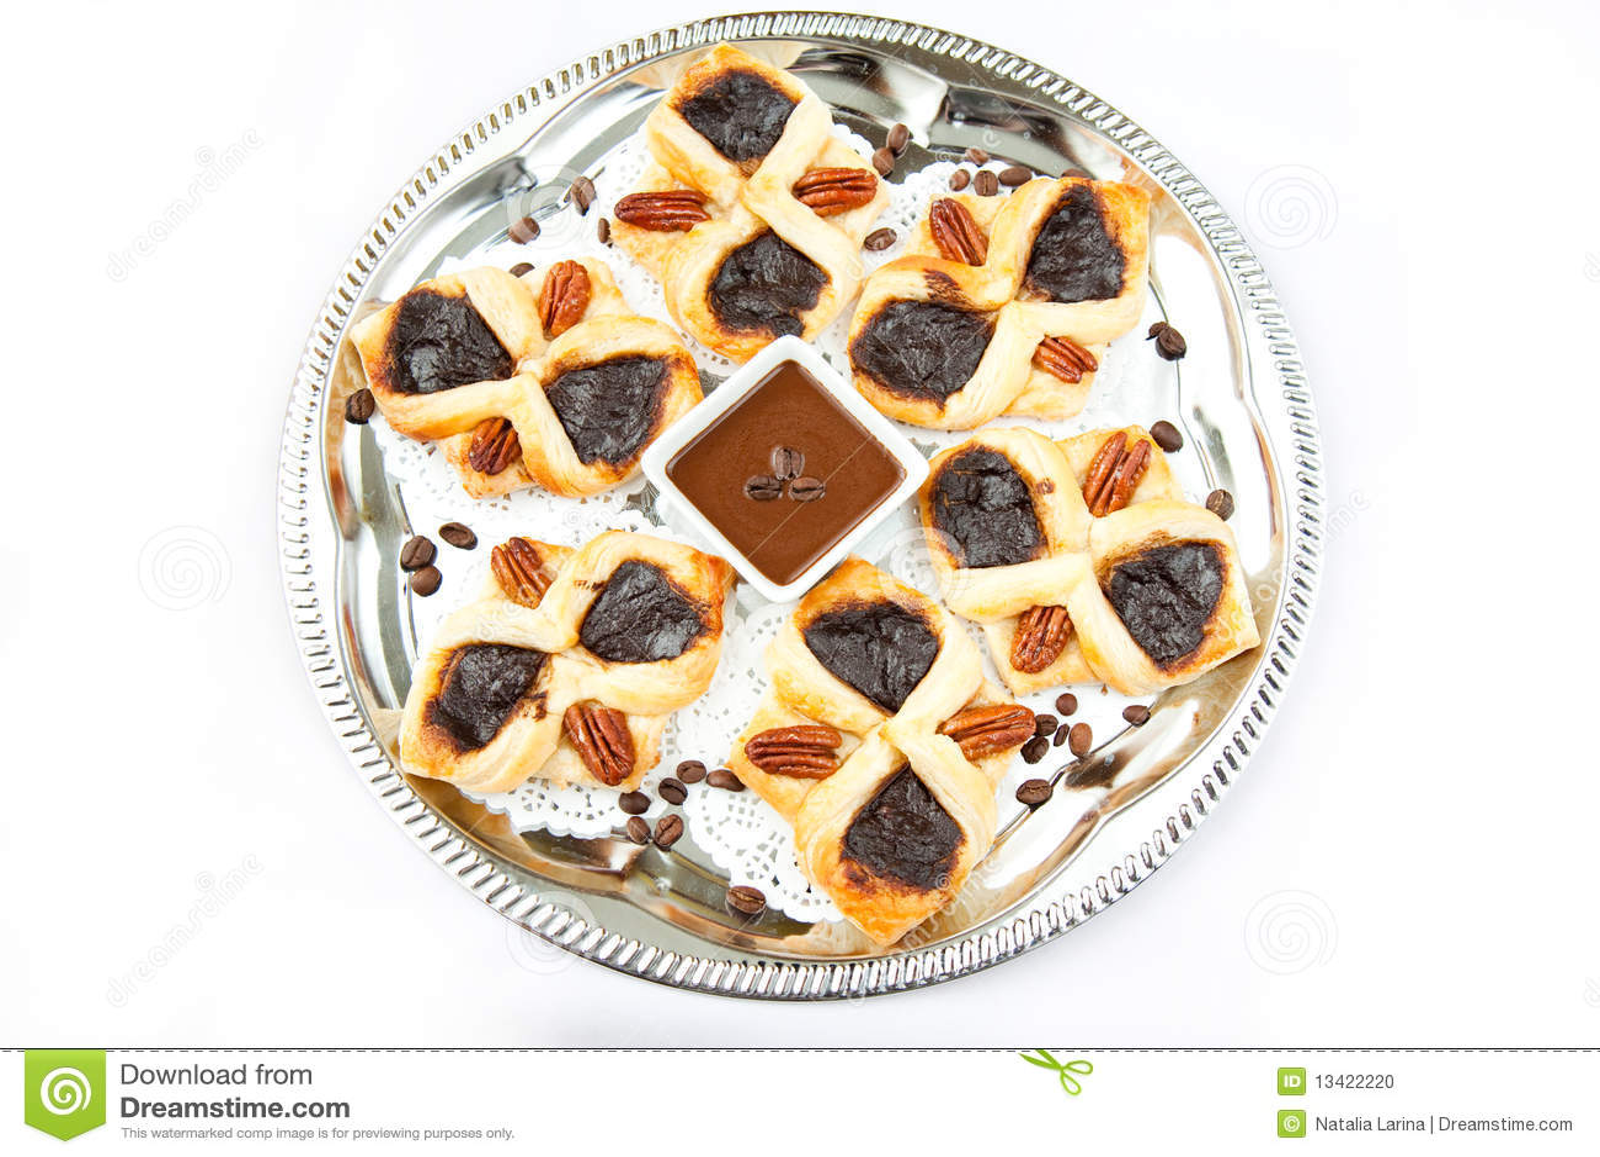 Flaky Croissant Stock Photo - Image: 13422220